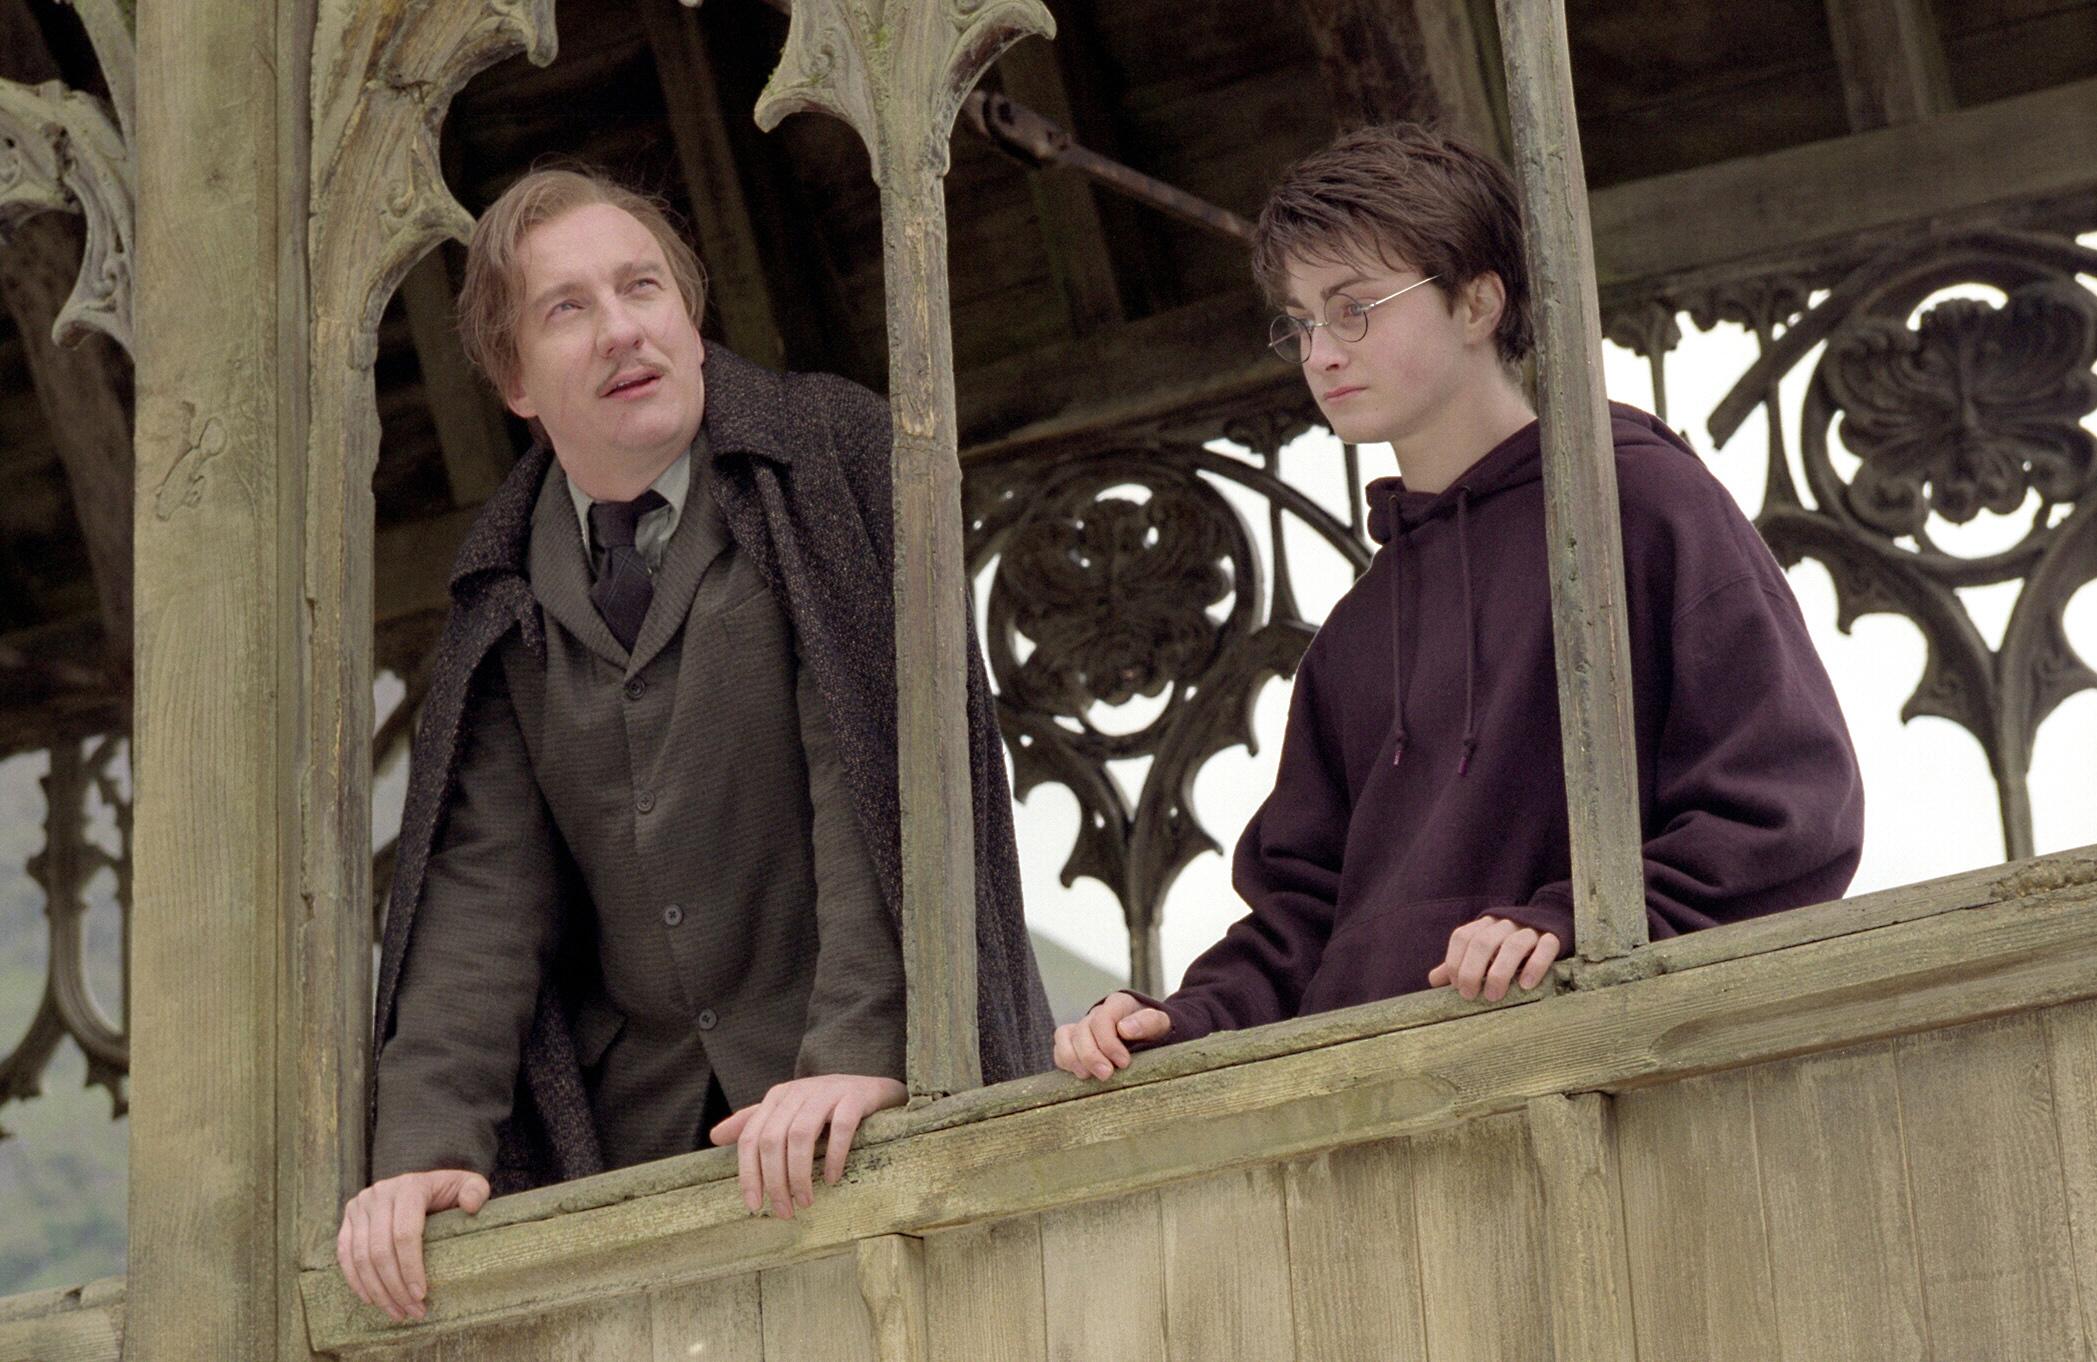 Harry Potter and the Prisoner of Azkaban, David Thewlis, Daniel Radcliffe, Professor Lupin